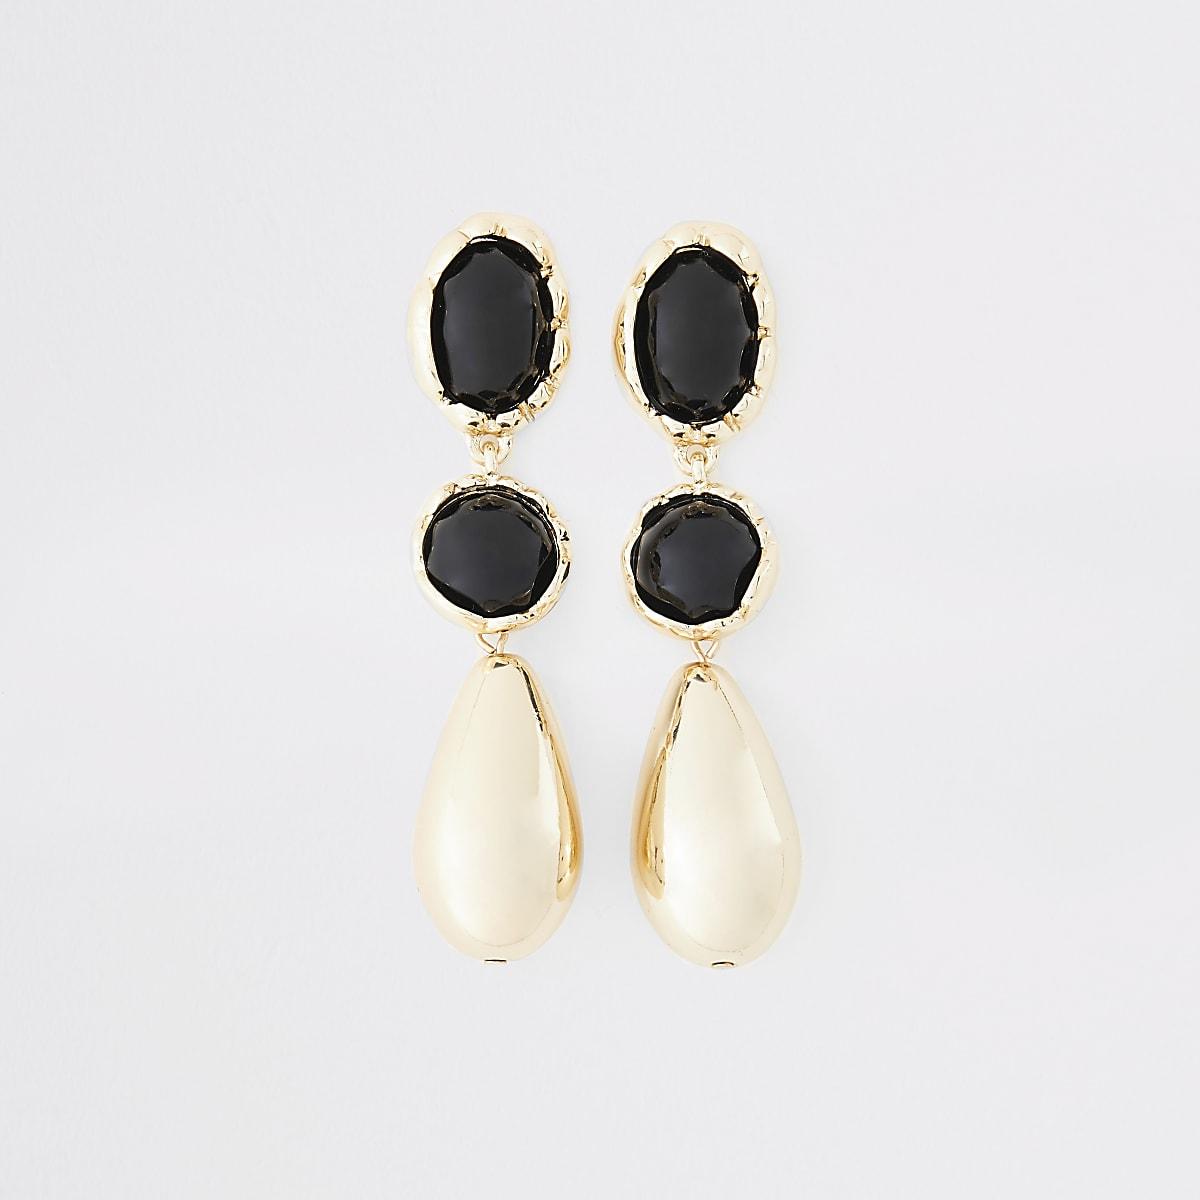 Gold colour tear drop earrings